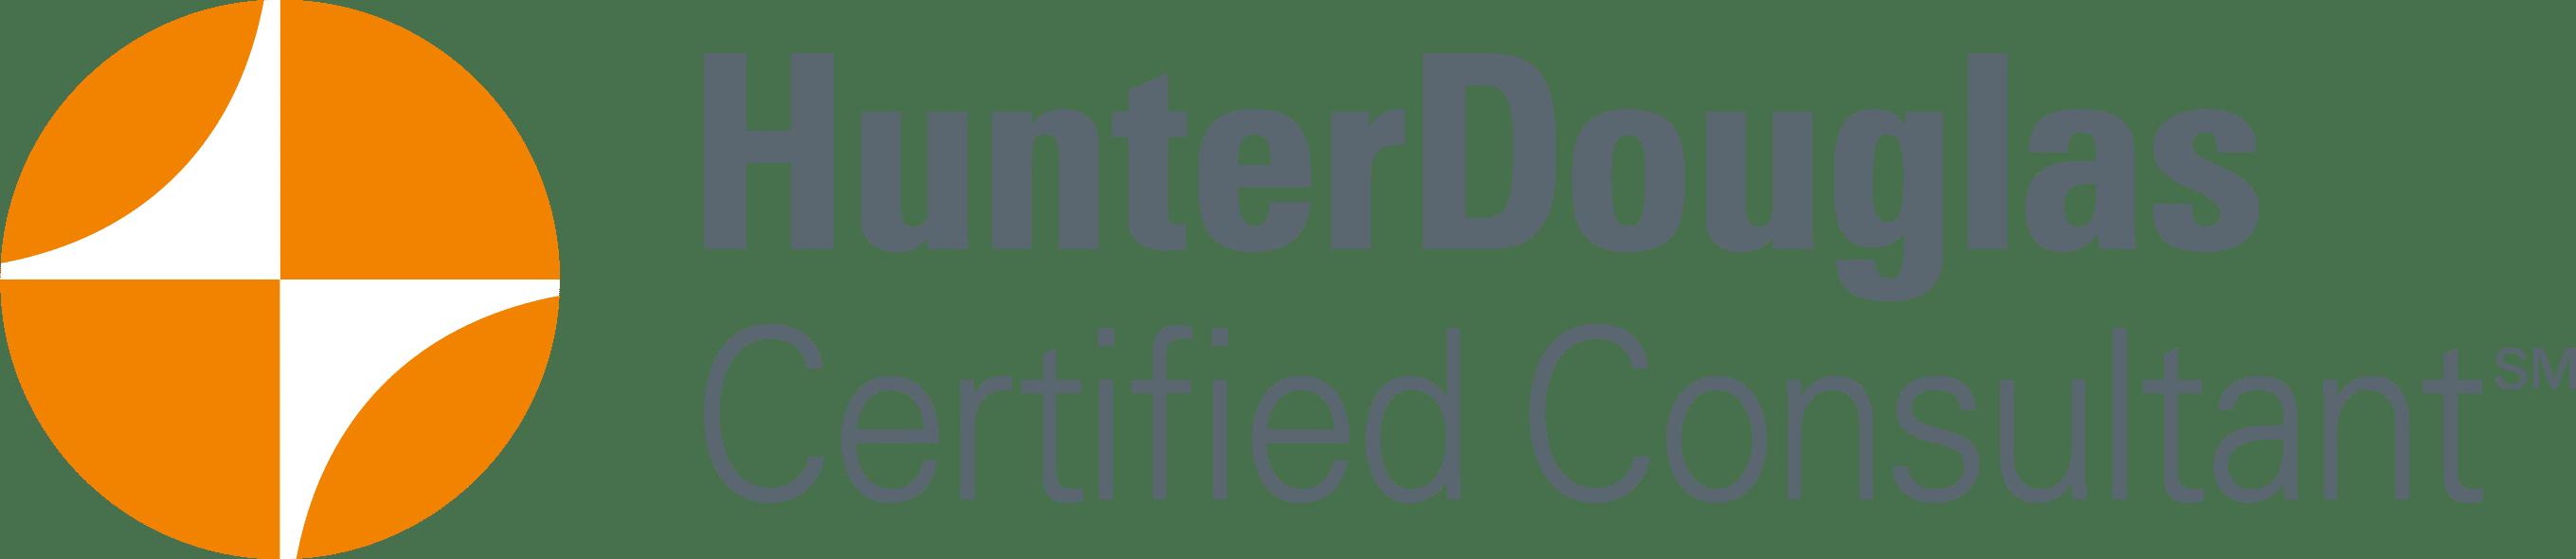 Hunter Douglas Certified Consultant